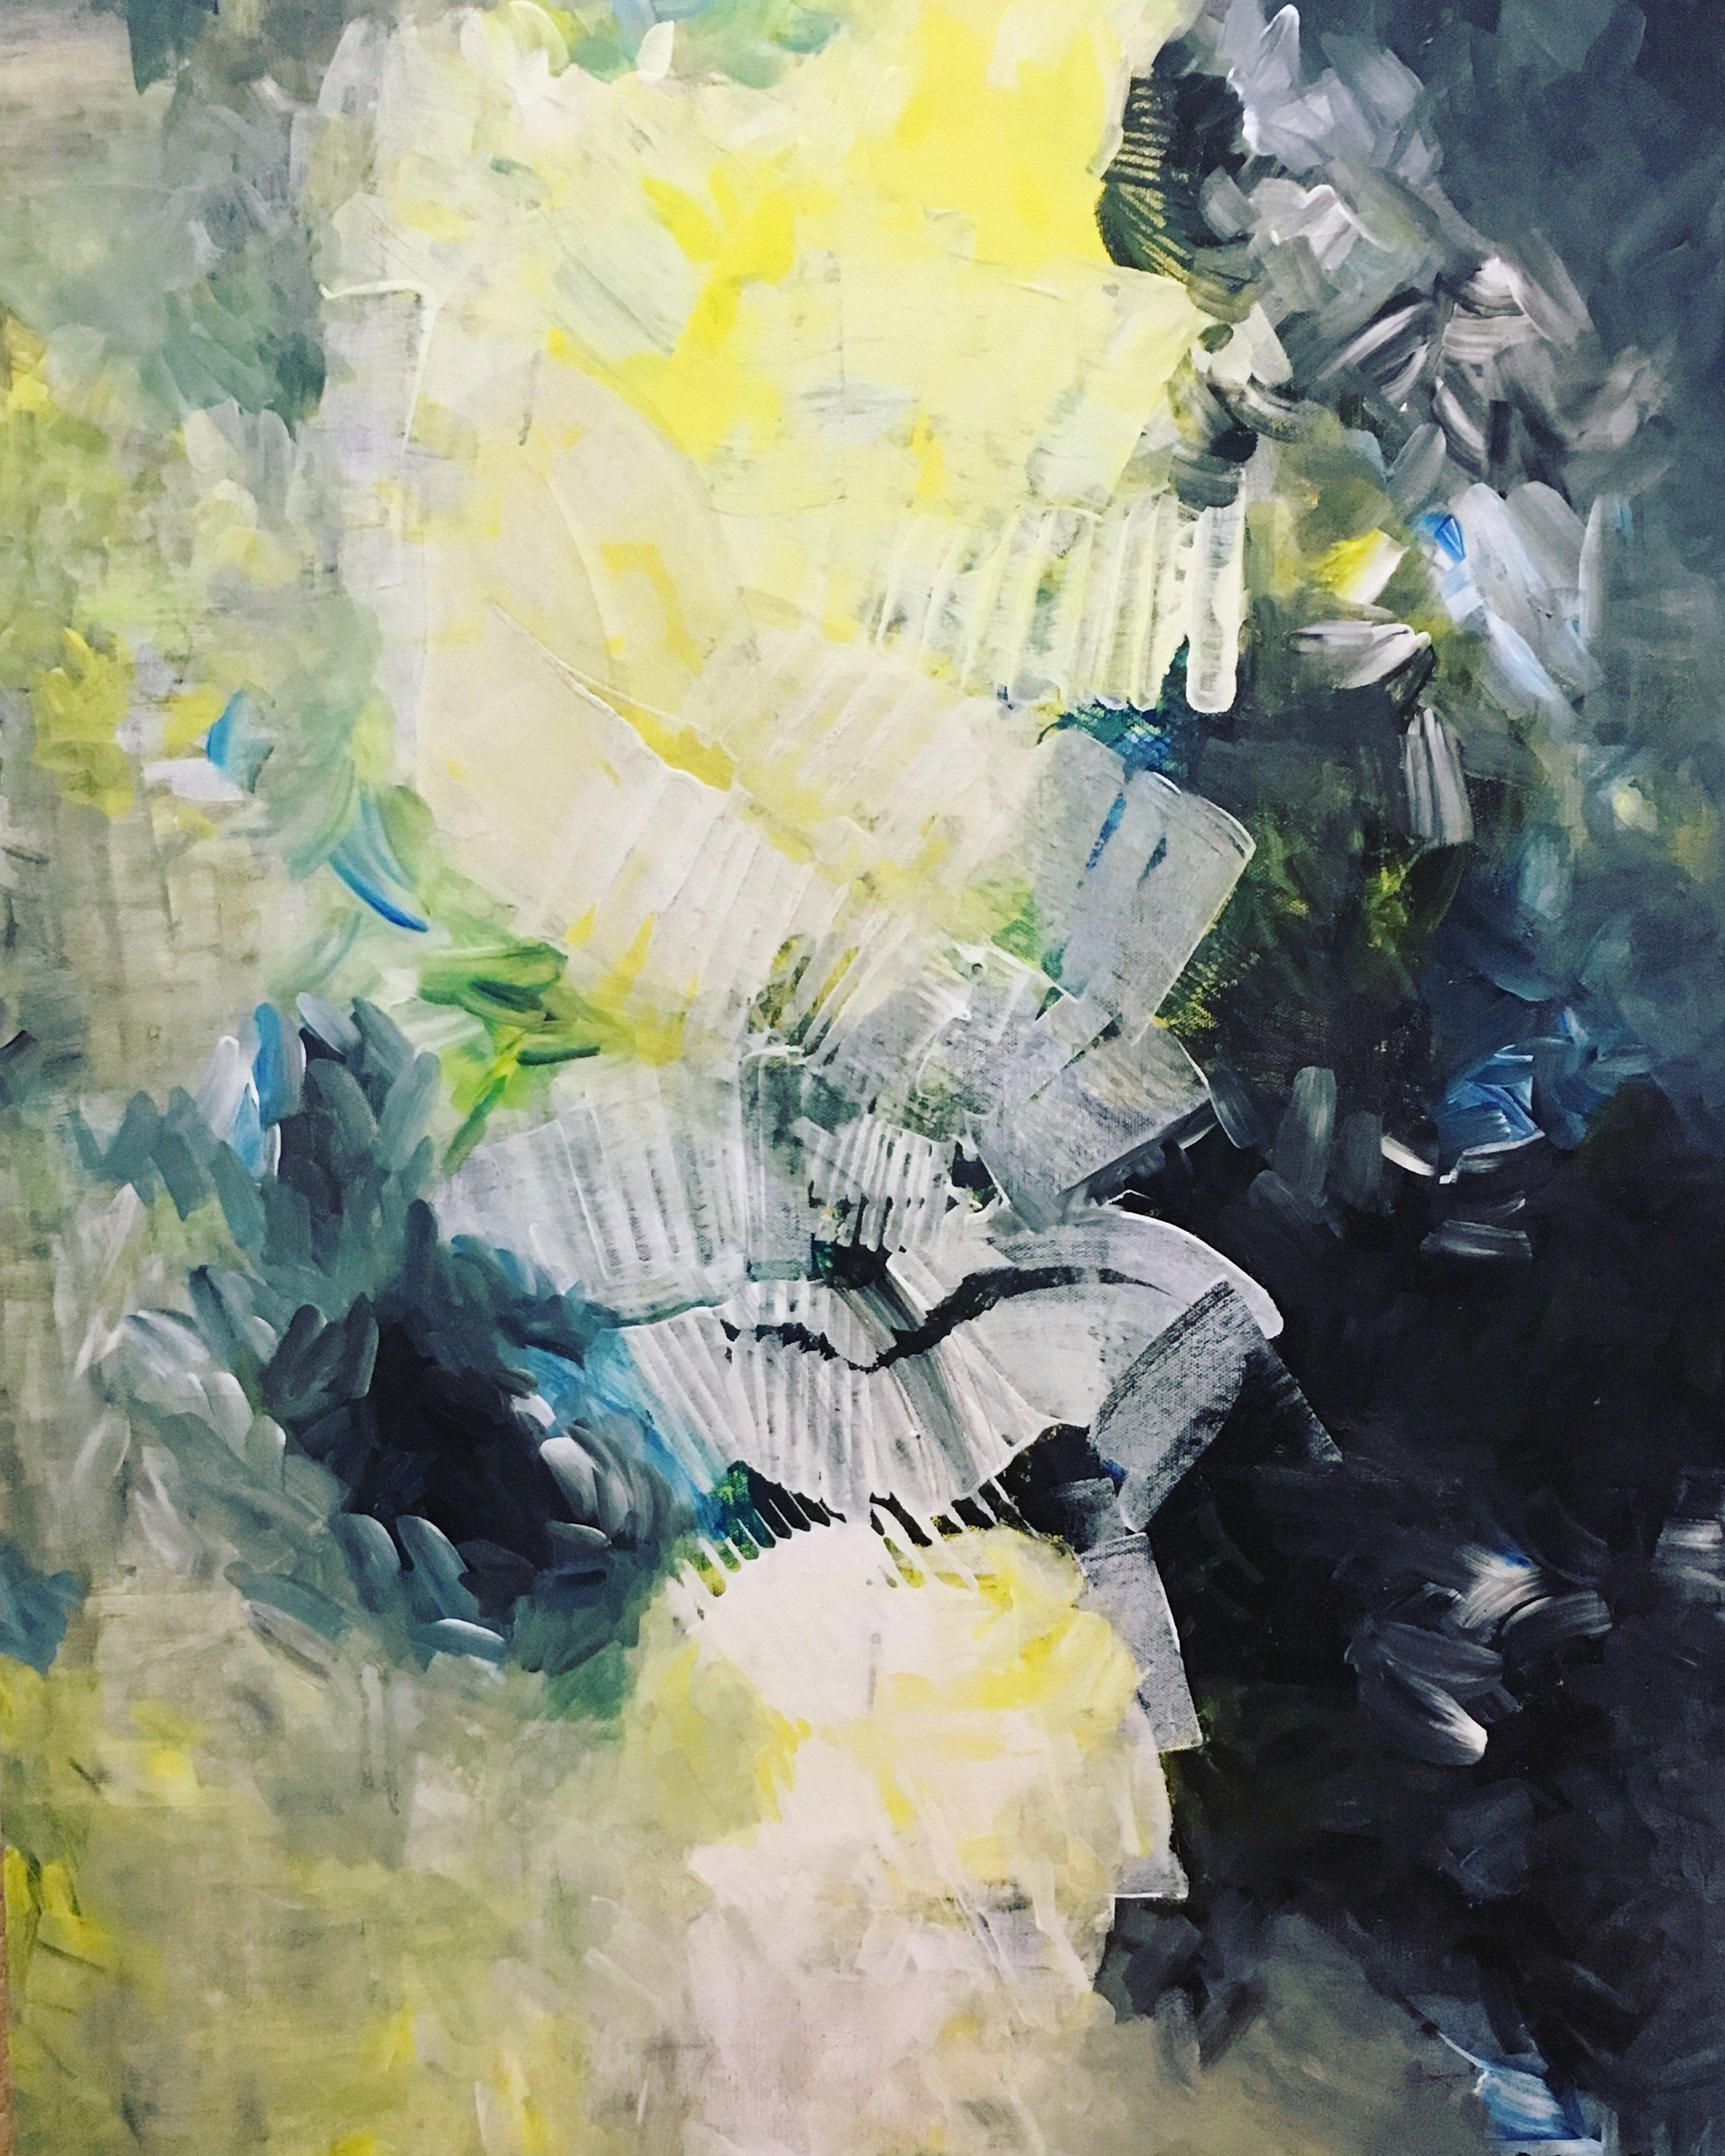 "Acrylic Paintings on 24"" x 36"" Canvas 2018"